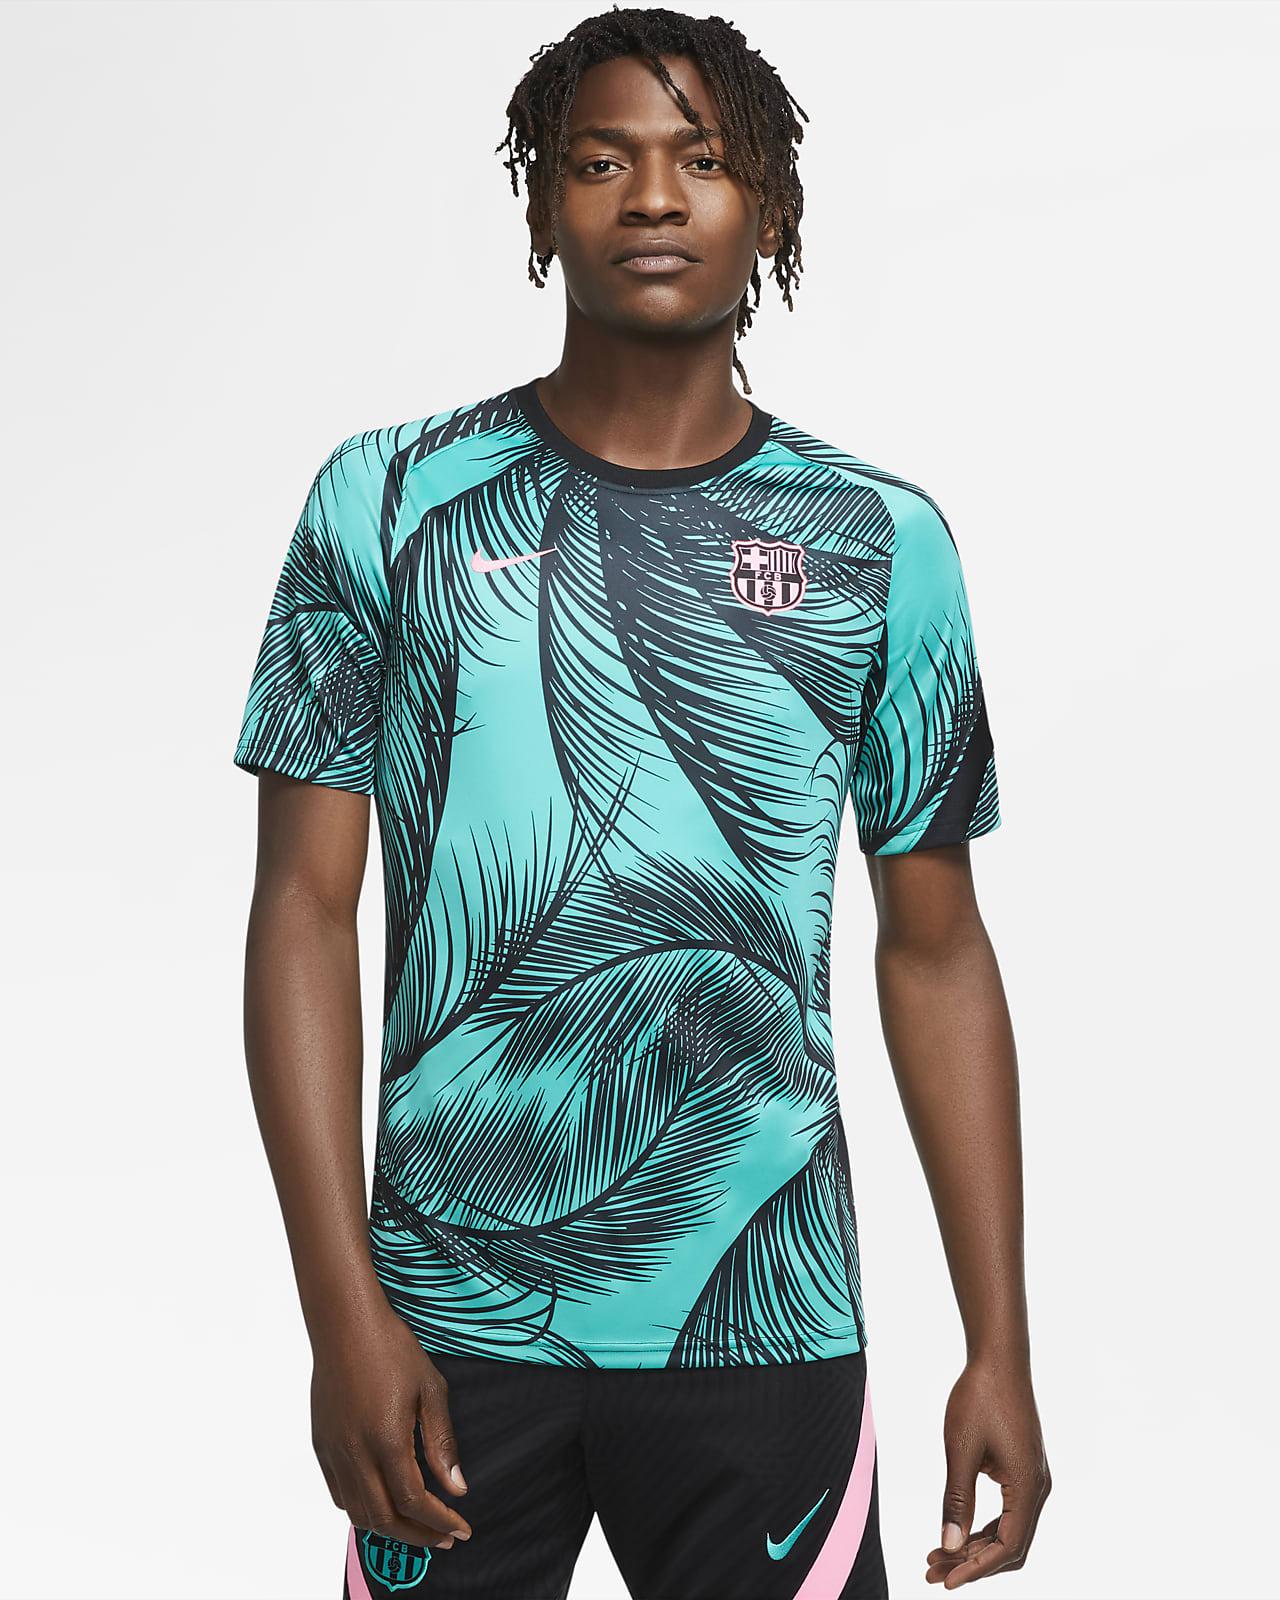 F.C. Barcelona Men's Pre-Match Short-Sleeve Football Top